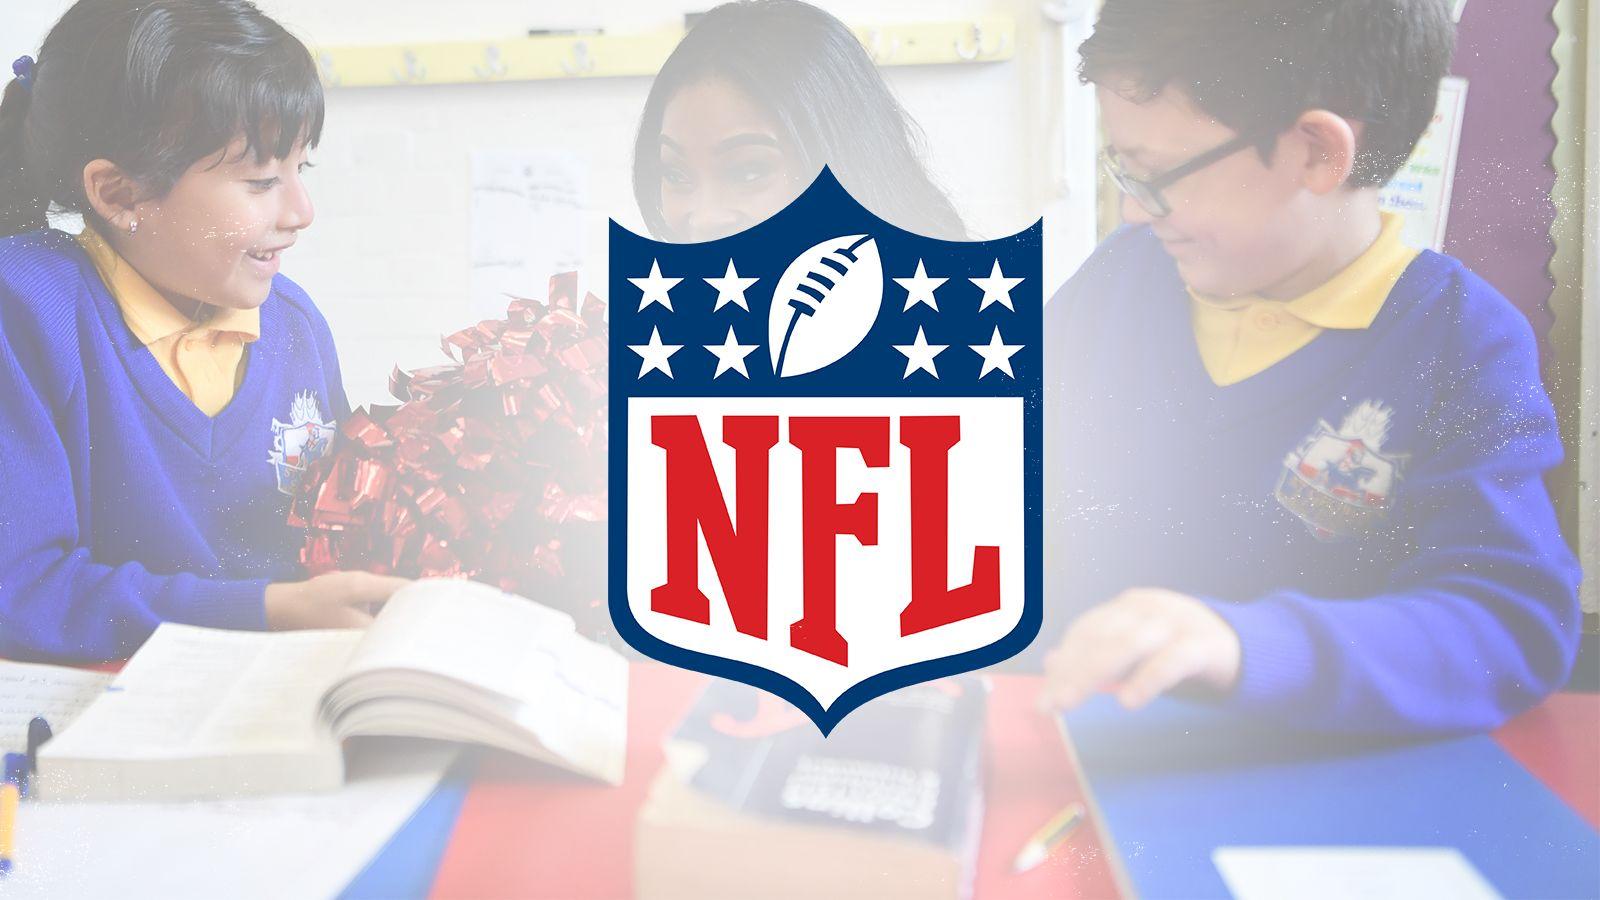 NFL Resources